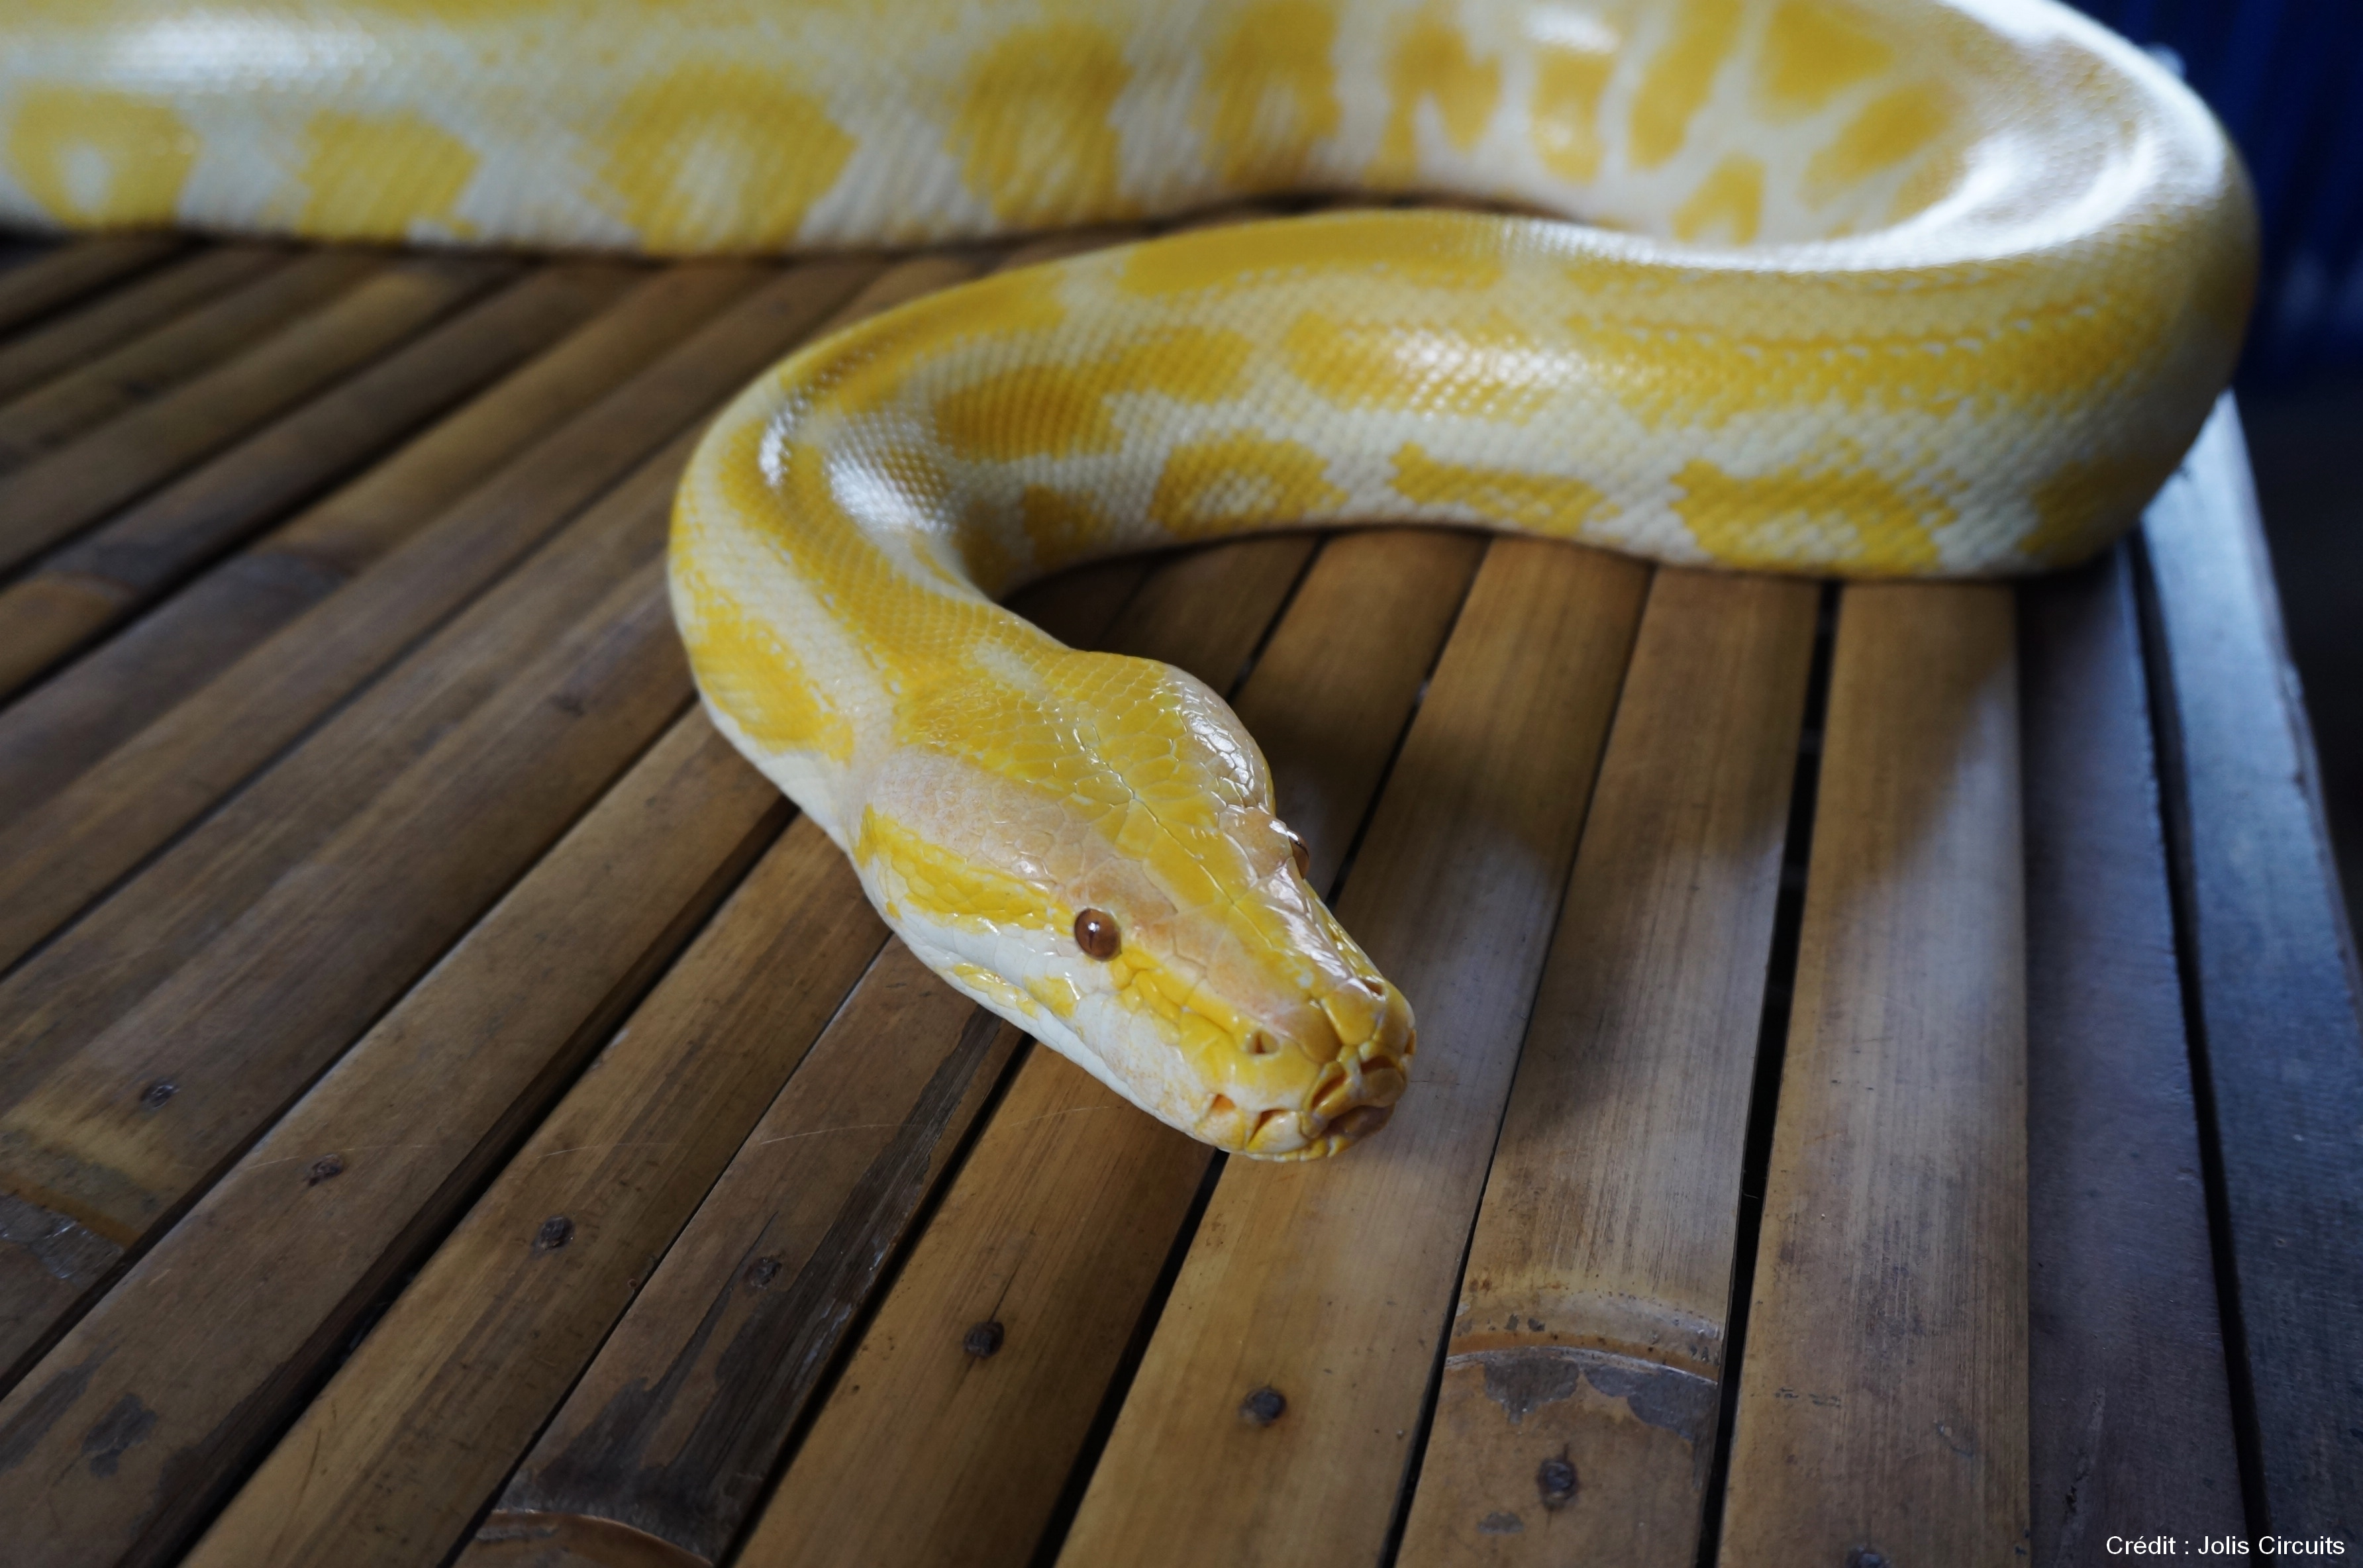 serpent philippines bohol